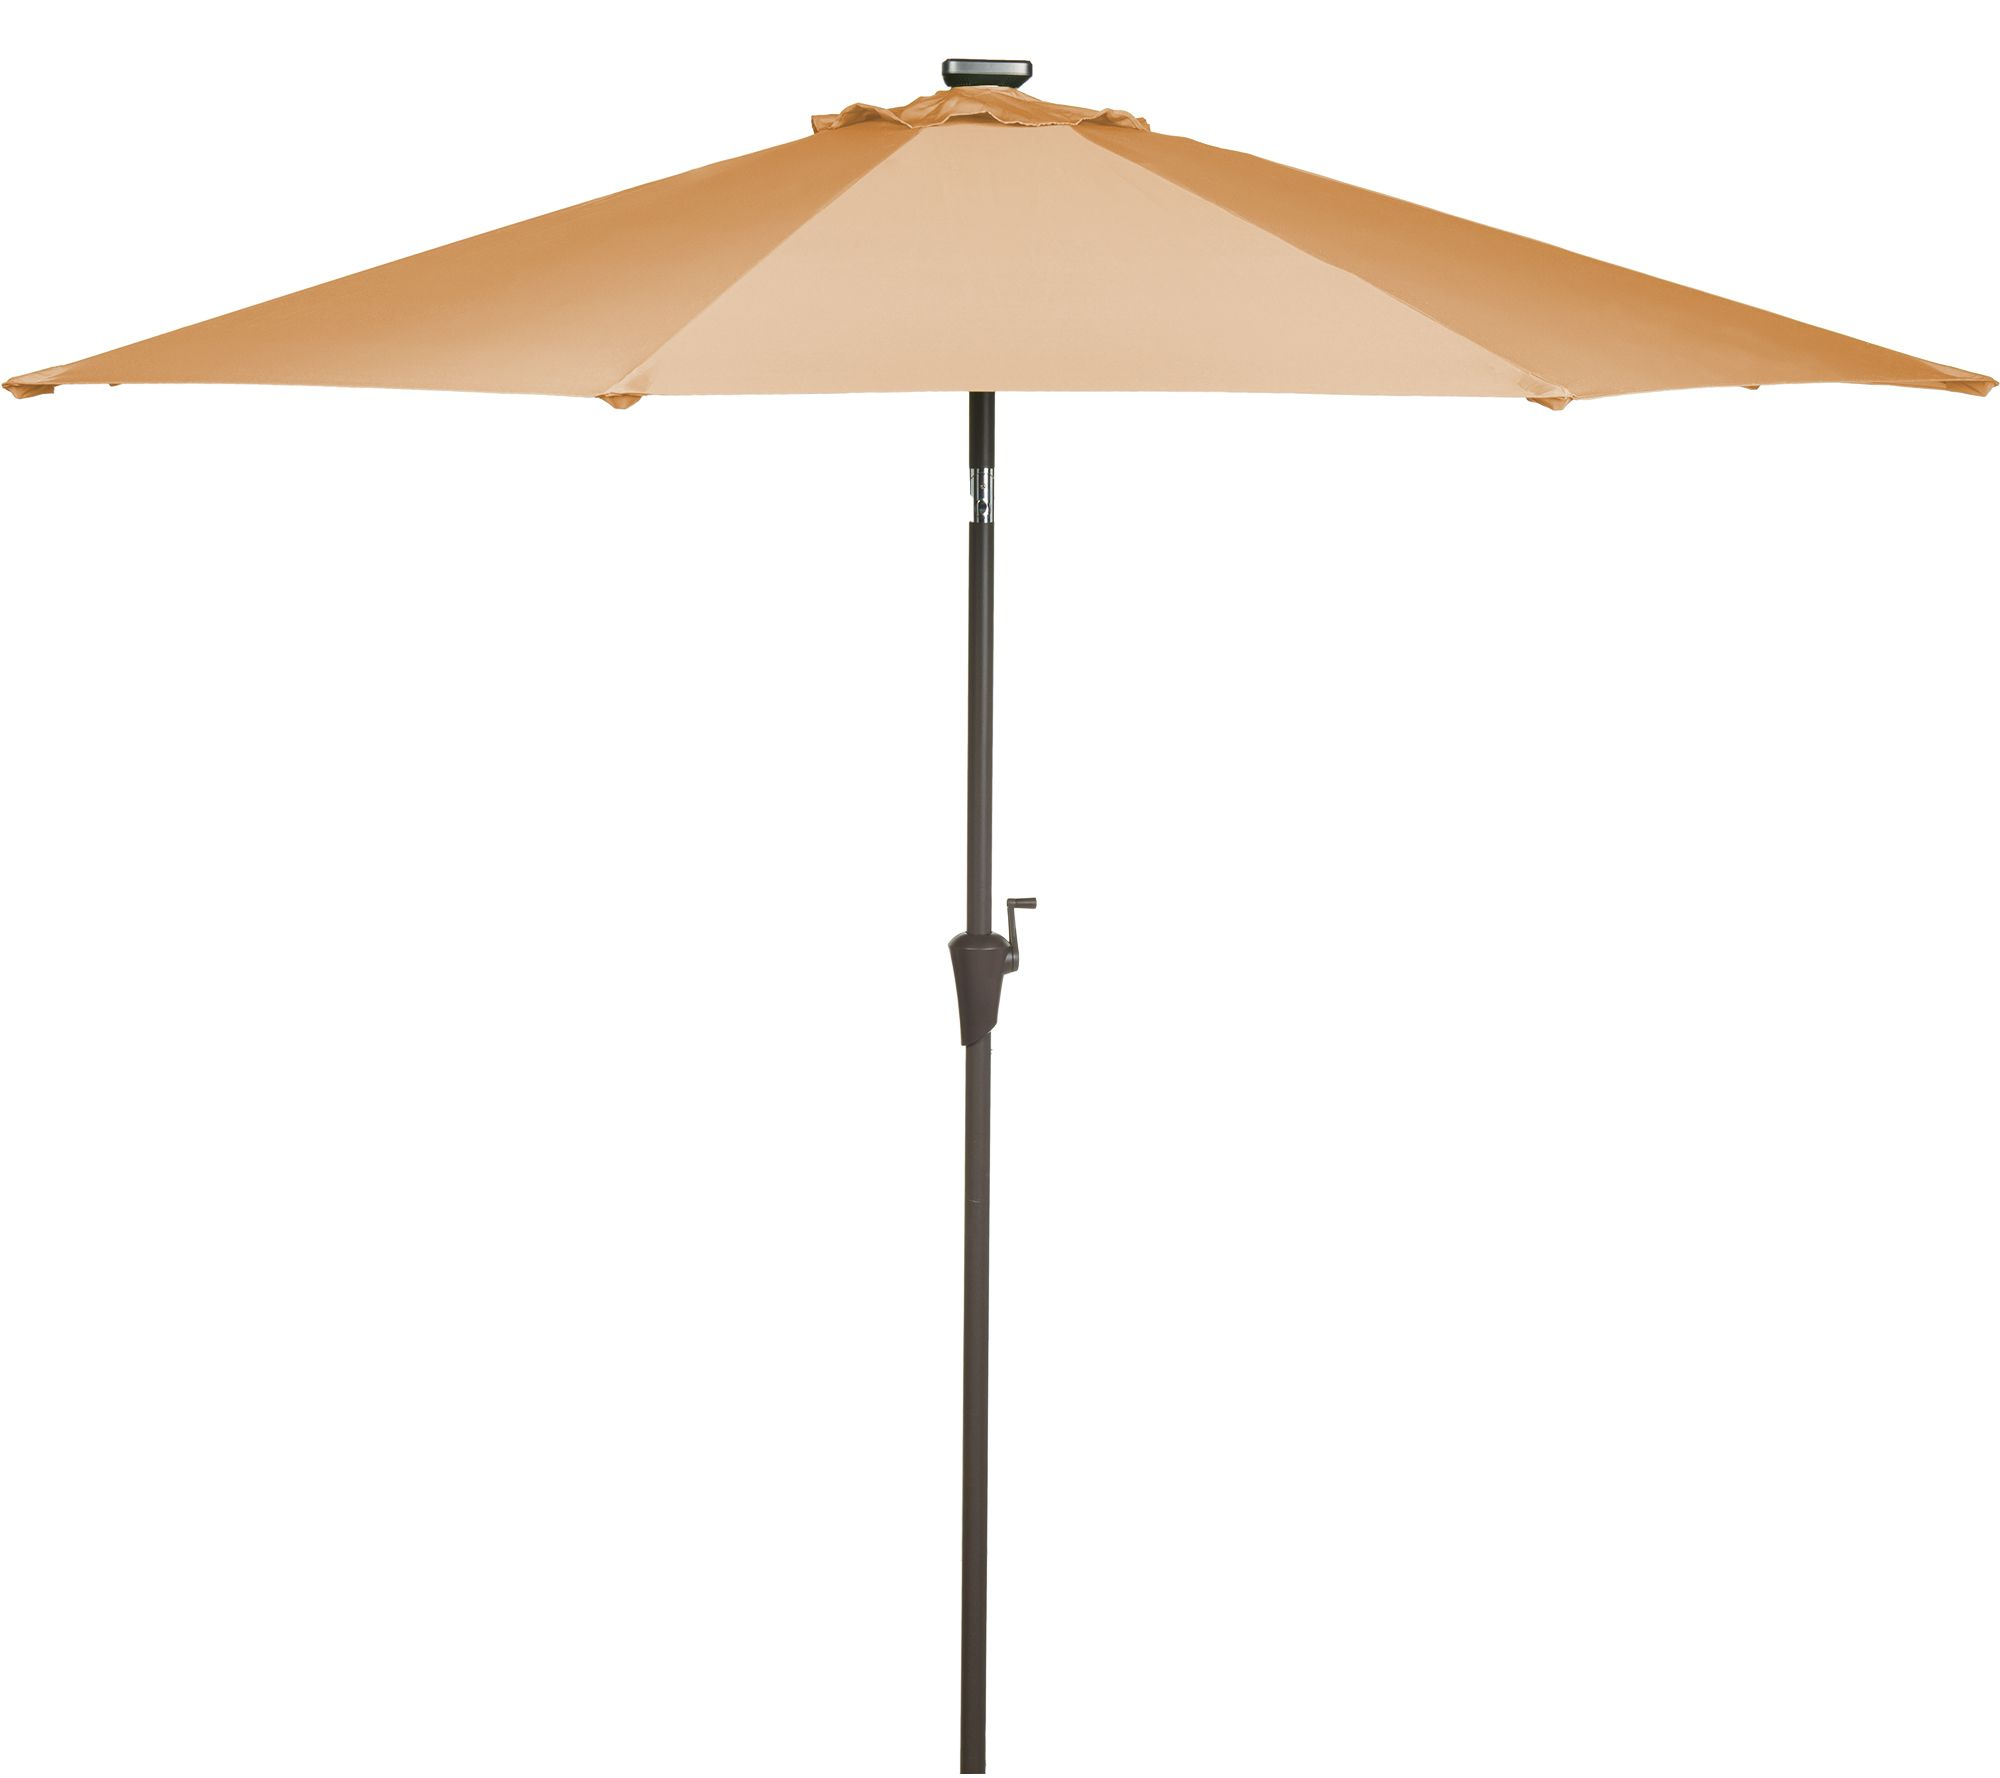 Umbrella covers for patio umbrellas - Atleisure 9 Starlight Solar Market Umbrella With Cover M41456